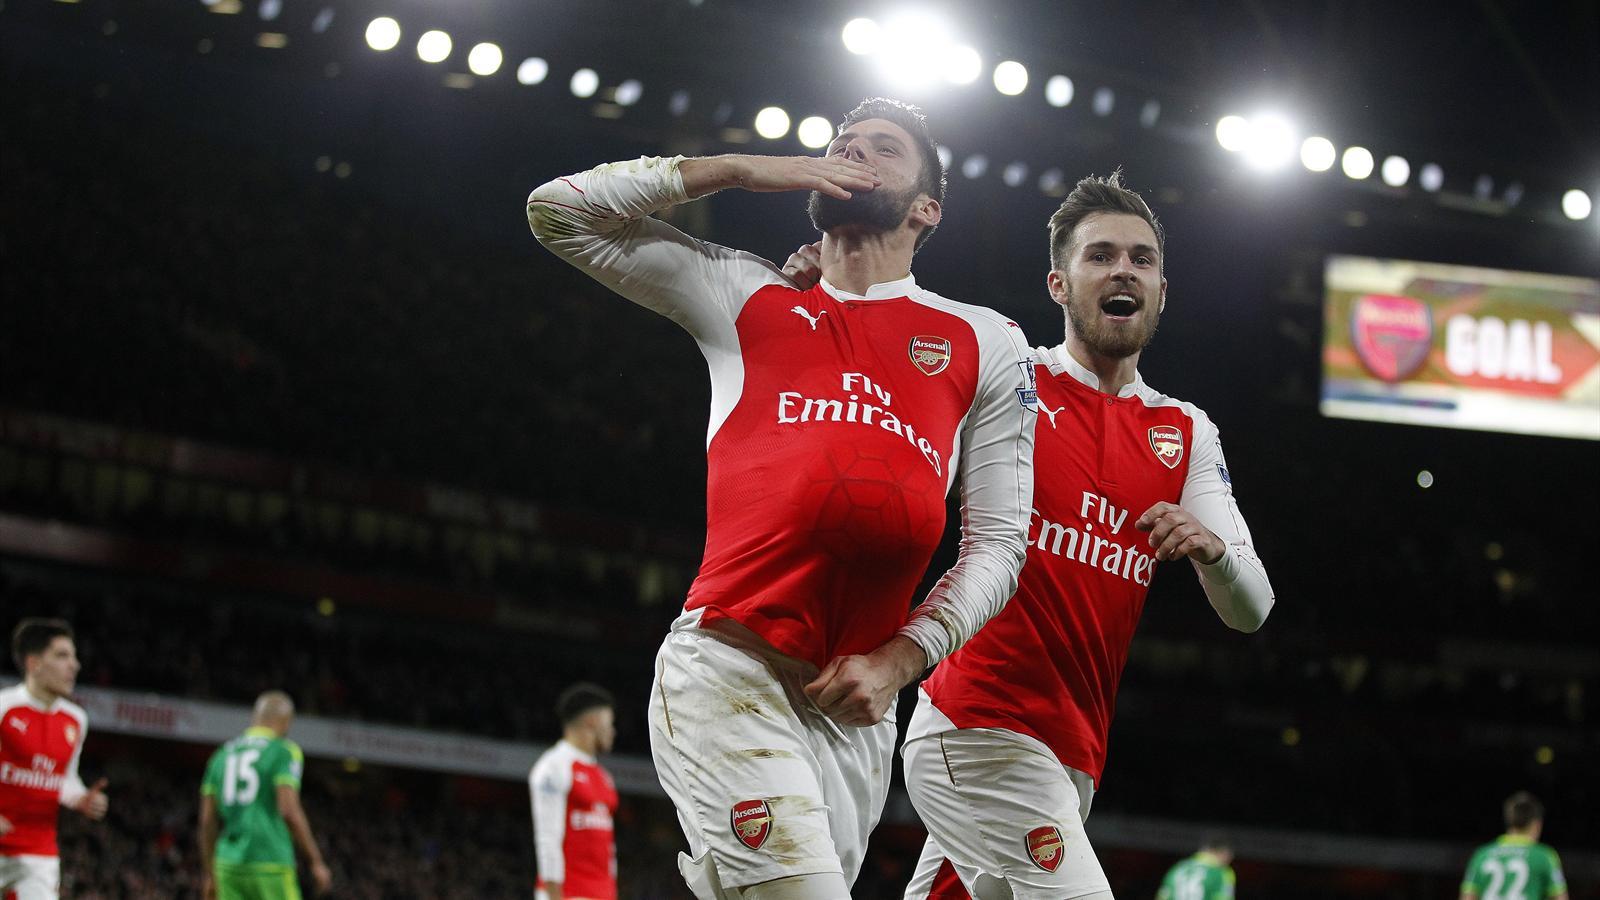 Arsenal's French striker Olivier Giroud (L) celebrates scoring his team's second goal